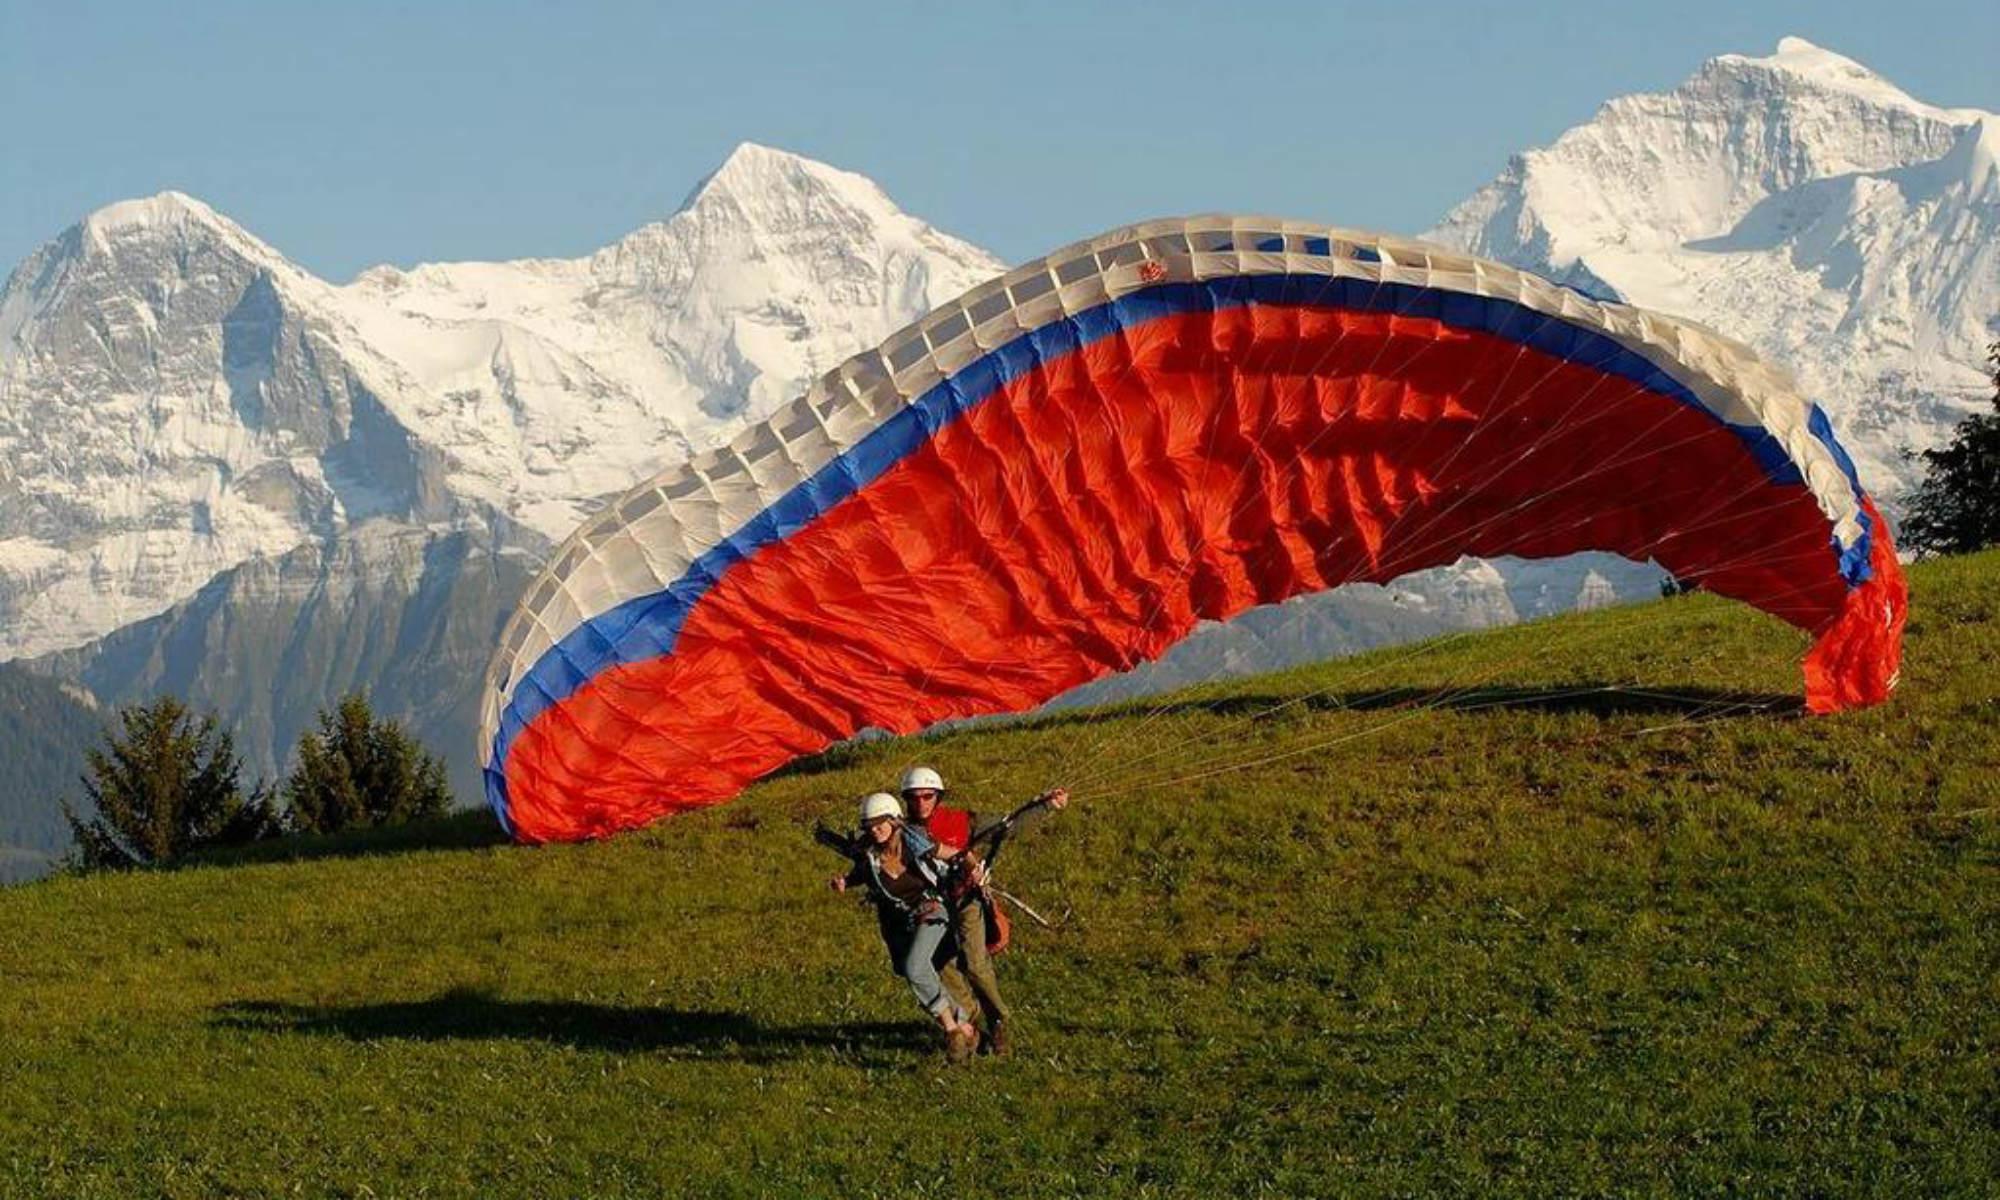 2 Tandem Paraglider beim Start ihres Fluges vor dem Jungfraumassiv.